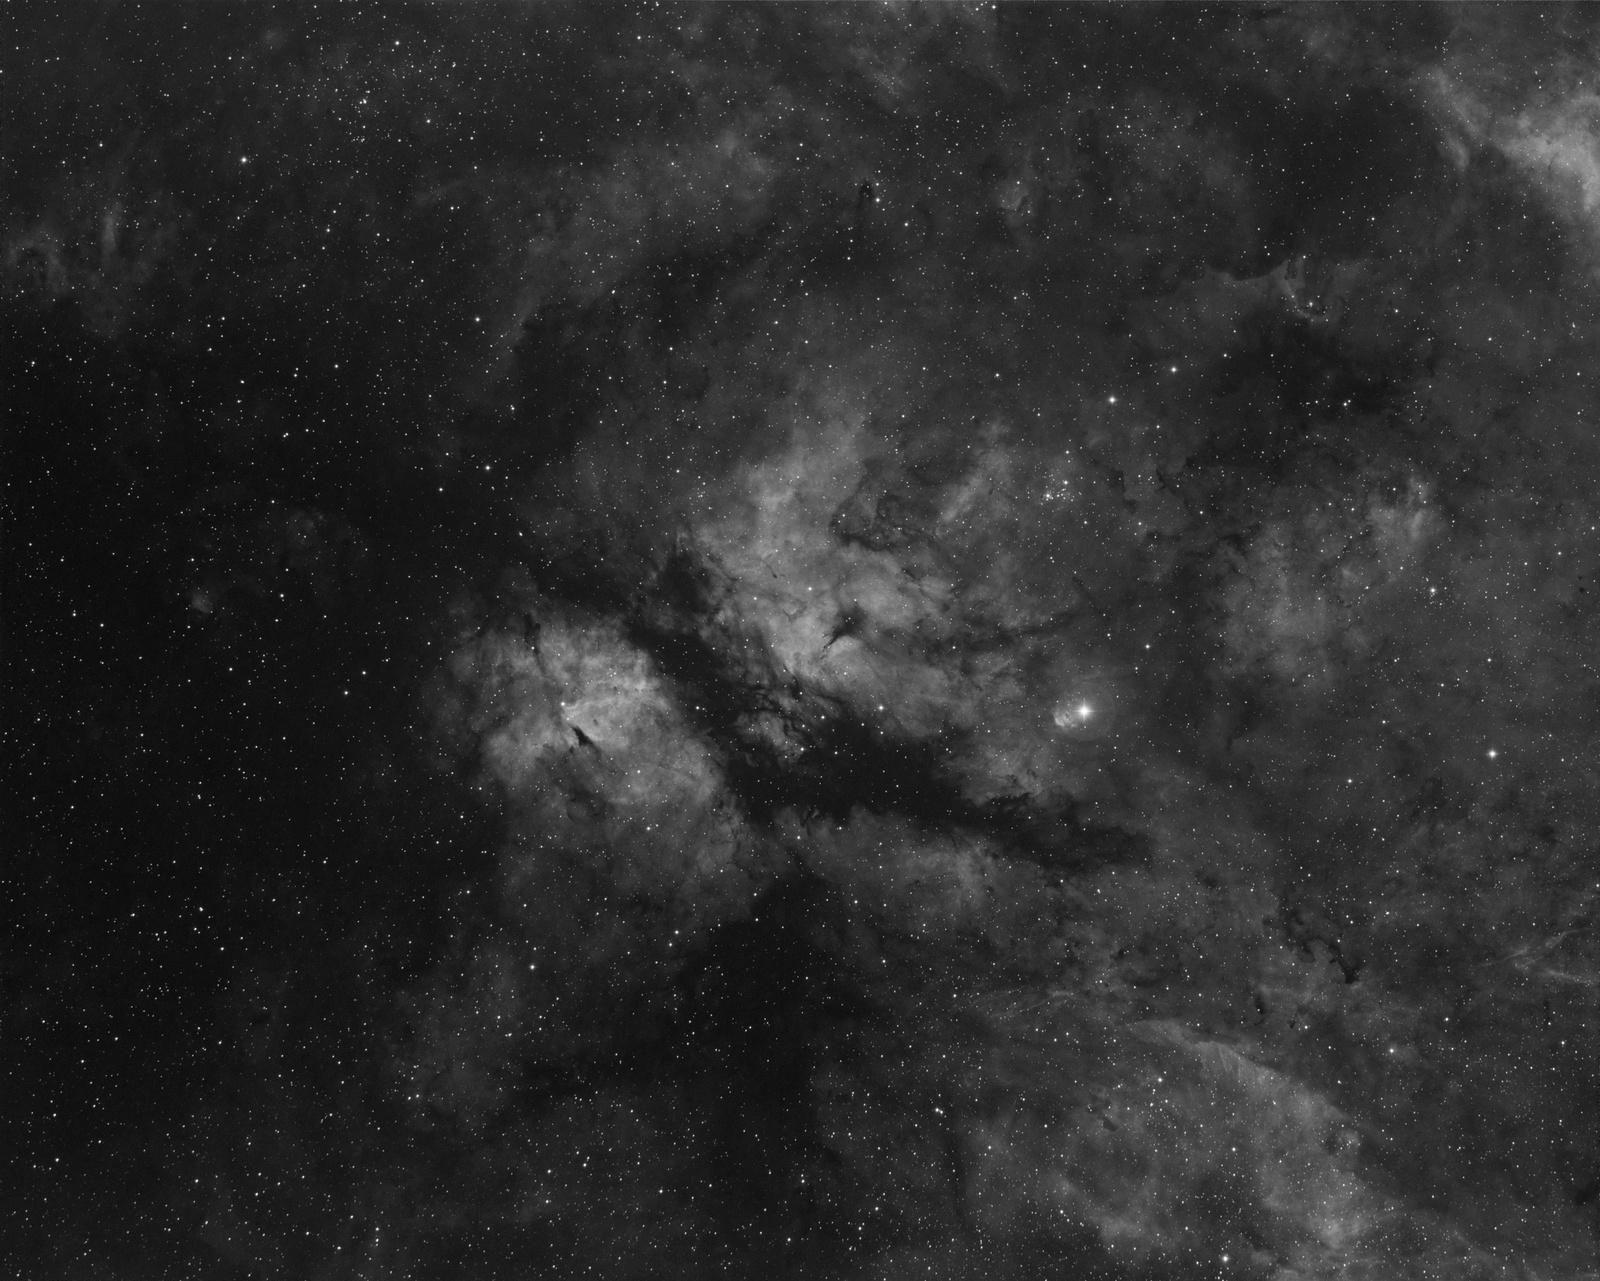 IC1318.thumb.jpg.007795a8de5c8976b0da8eb23839259f.jpg